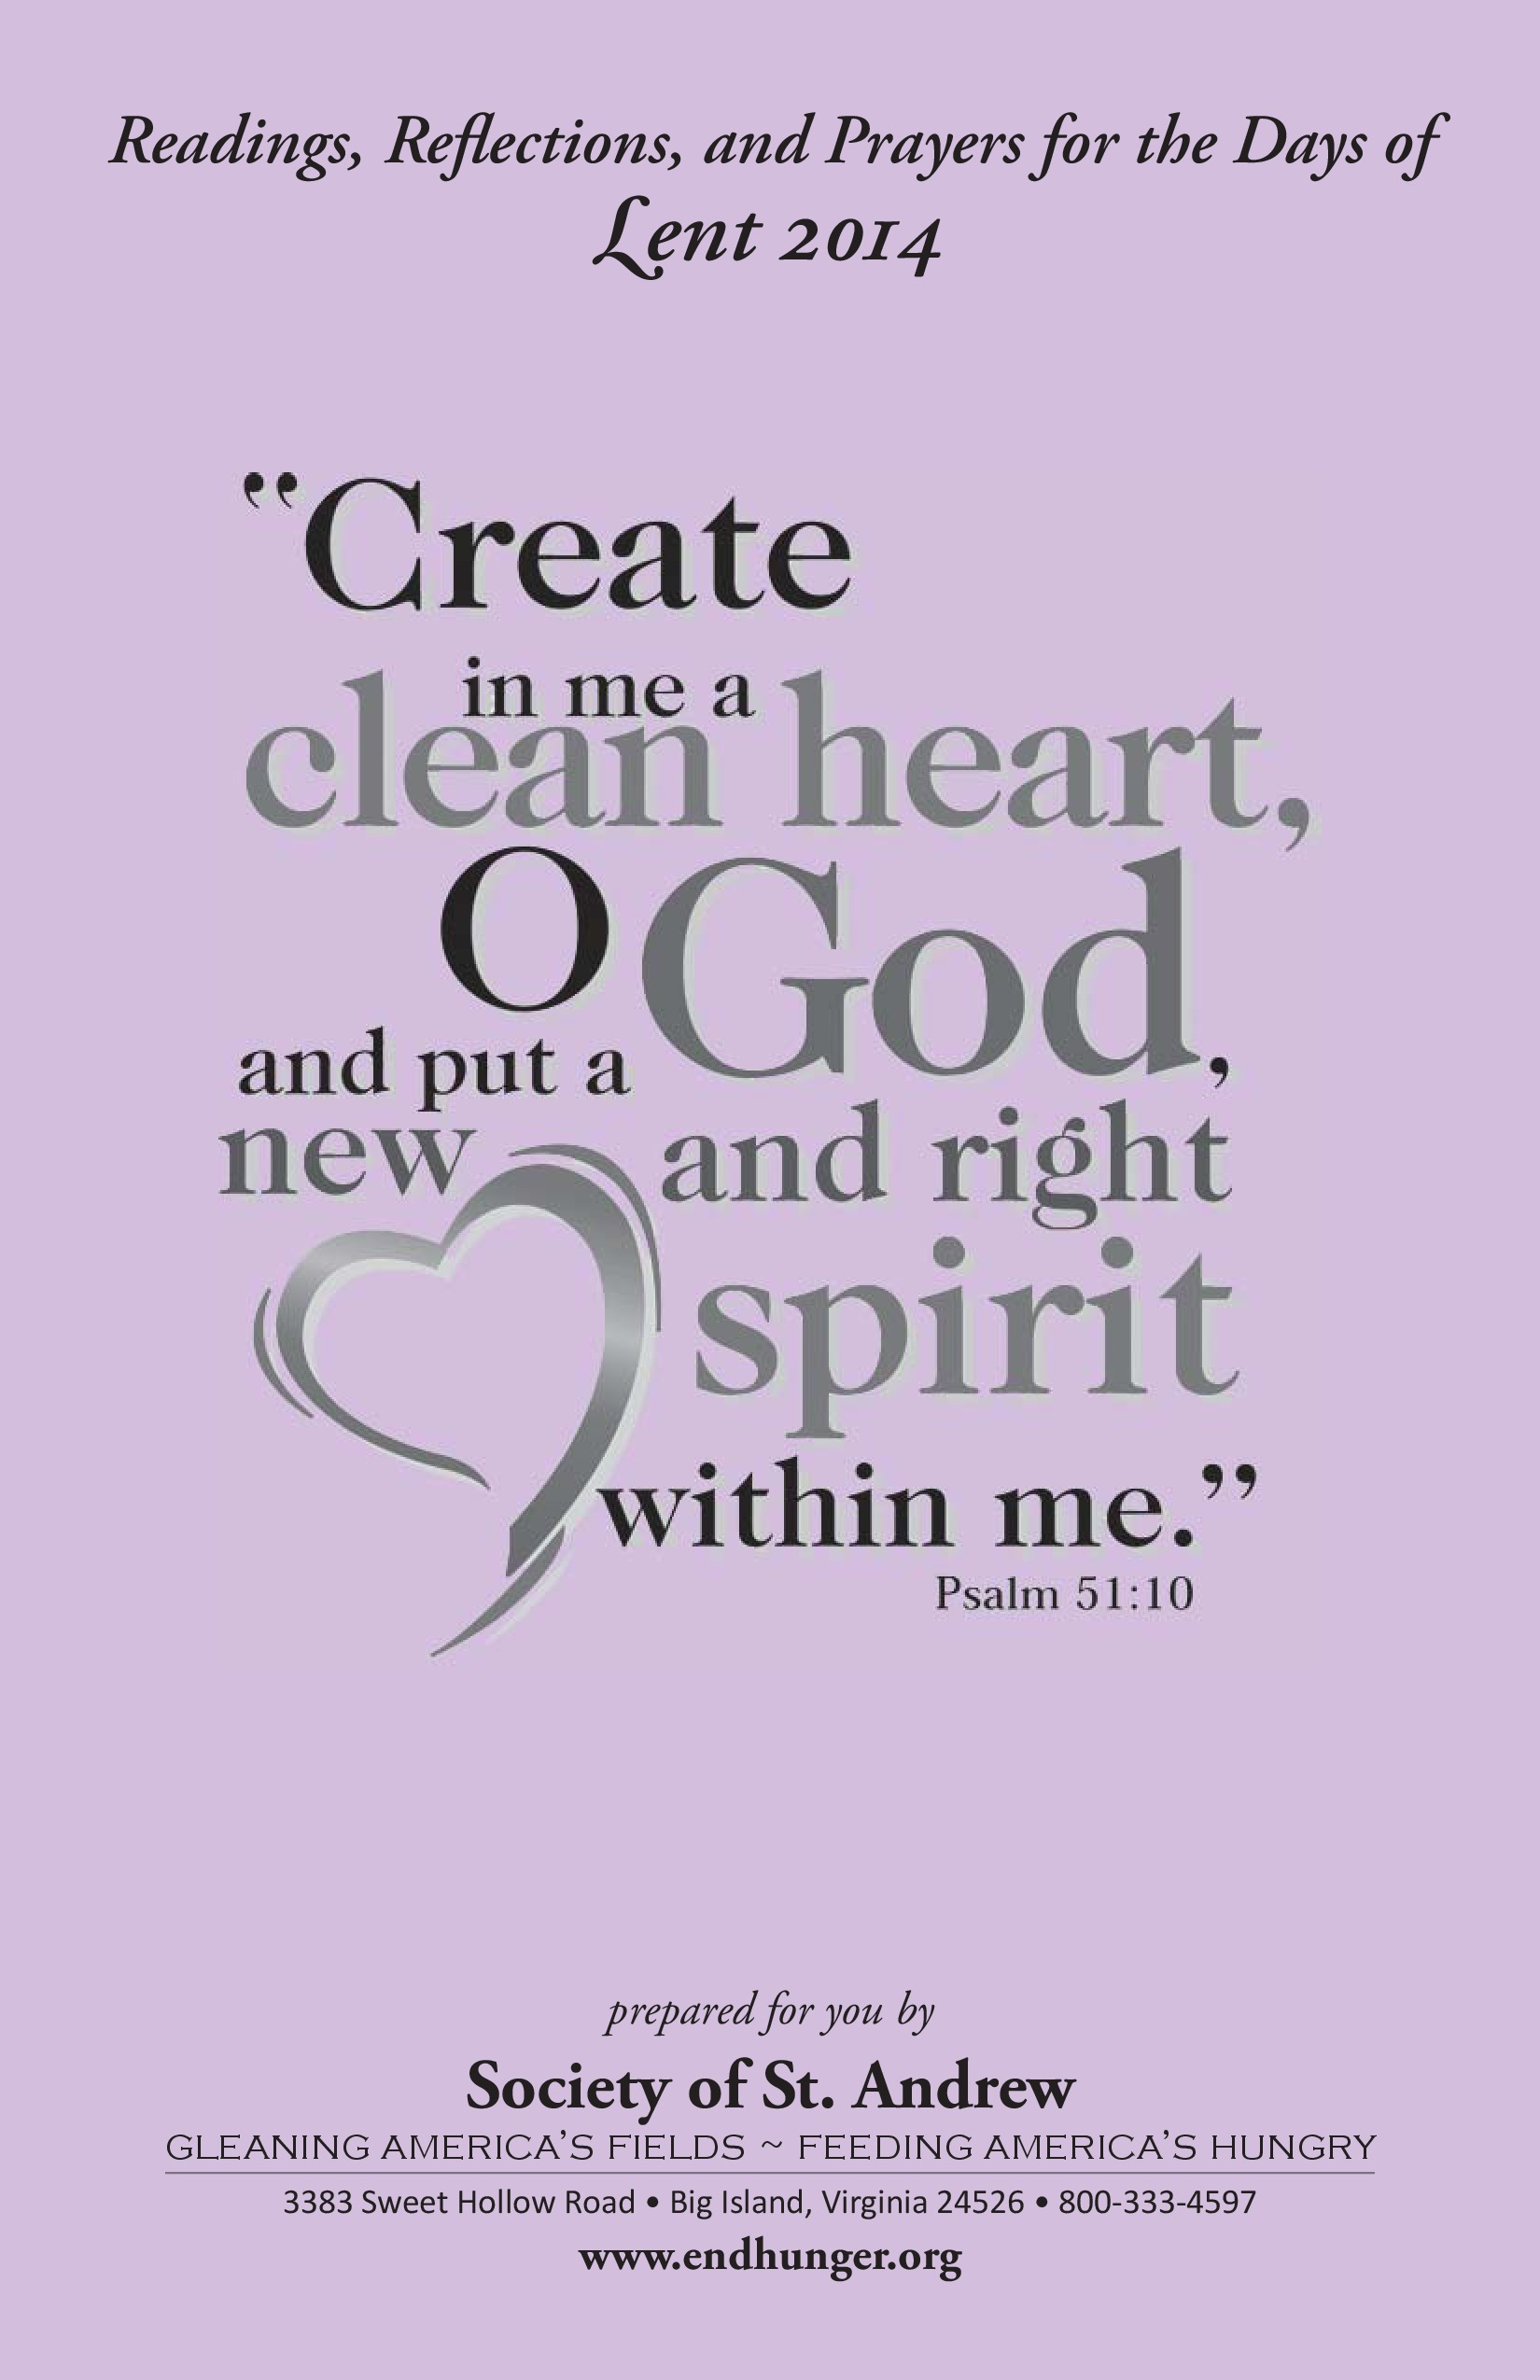 Open Your Heart, Listen to God